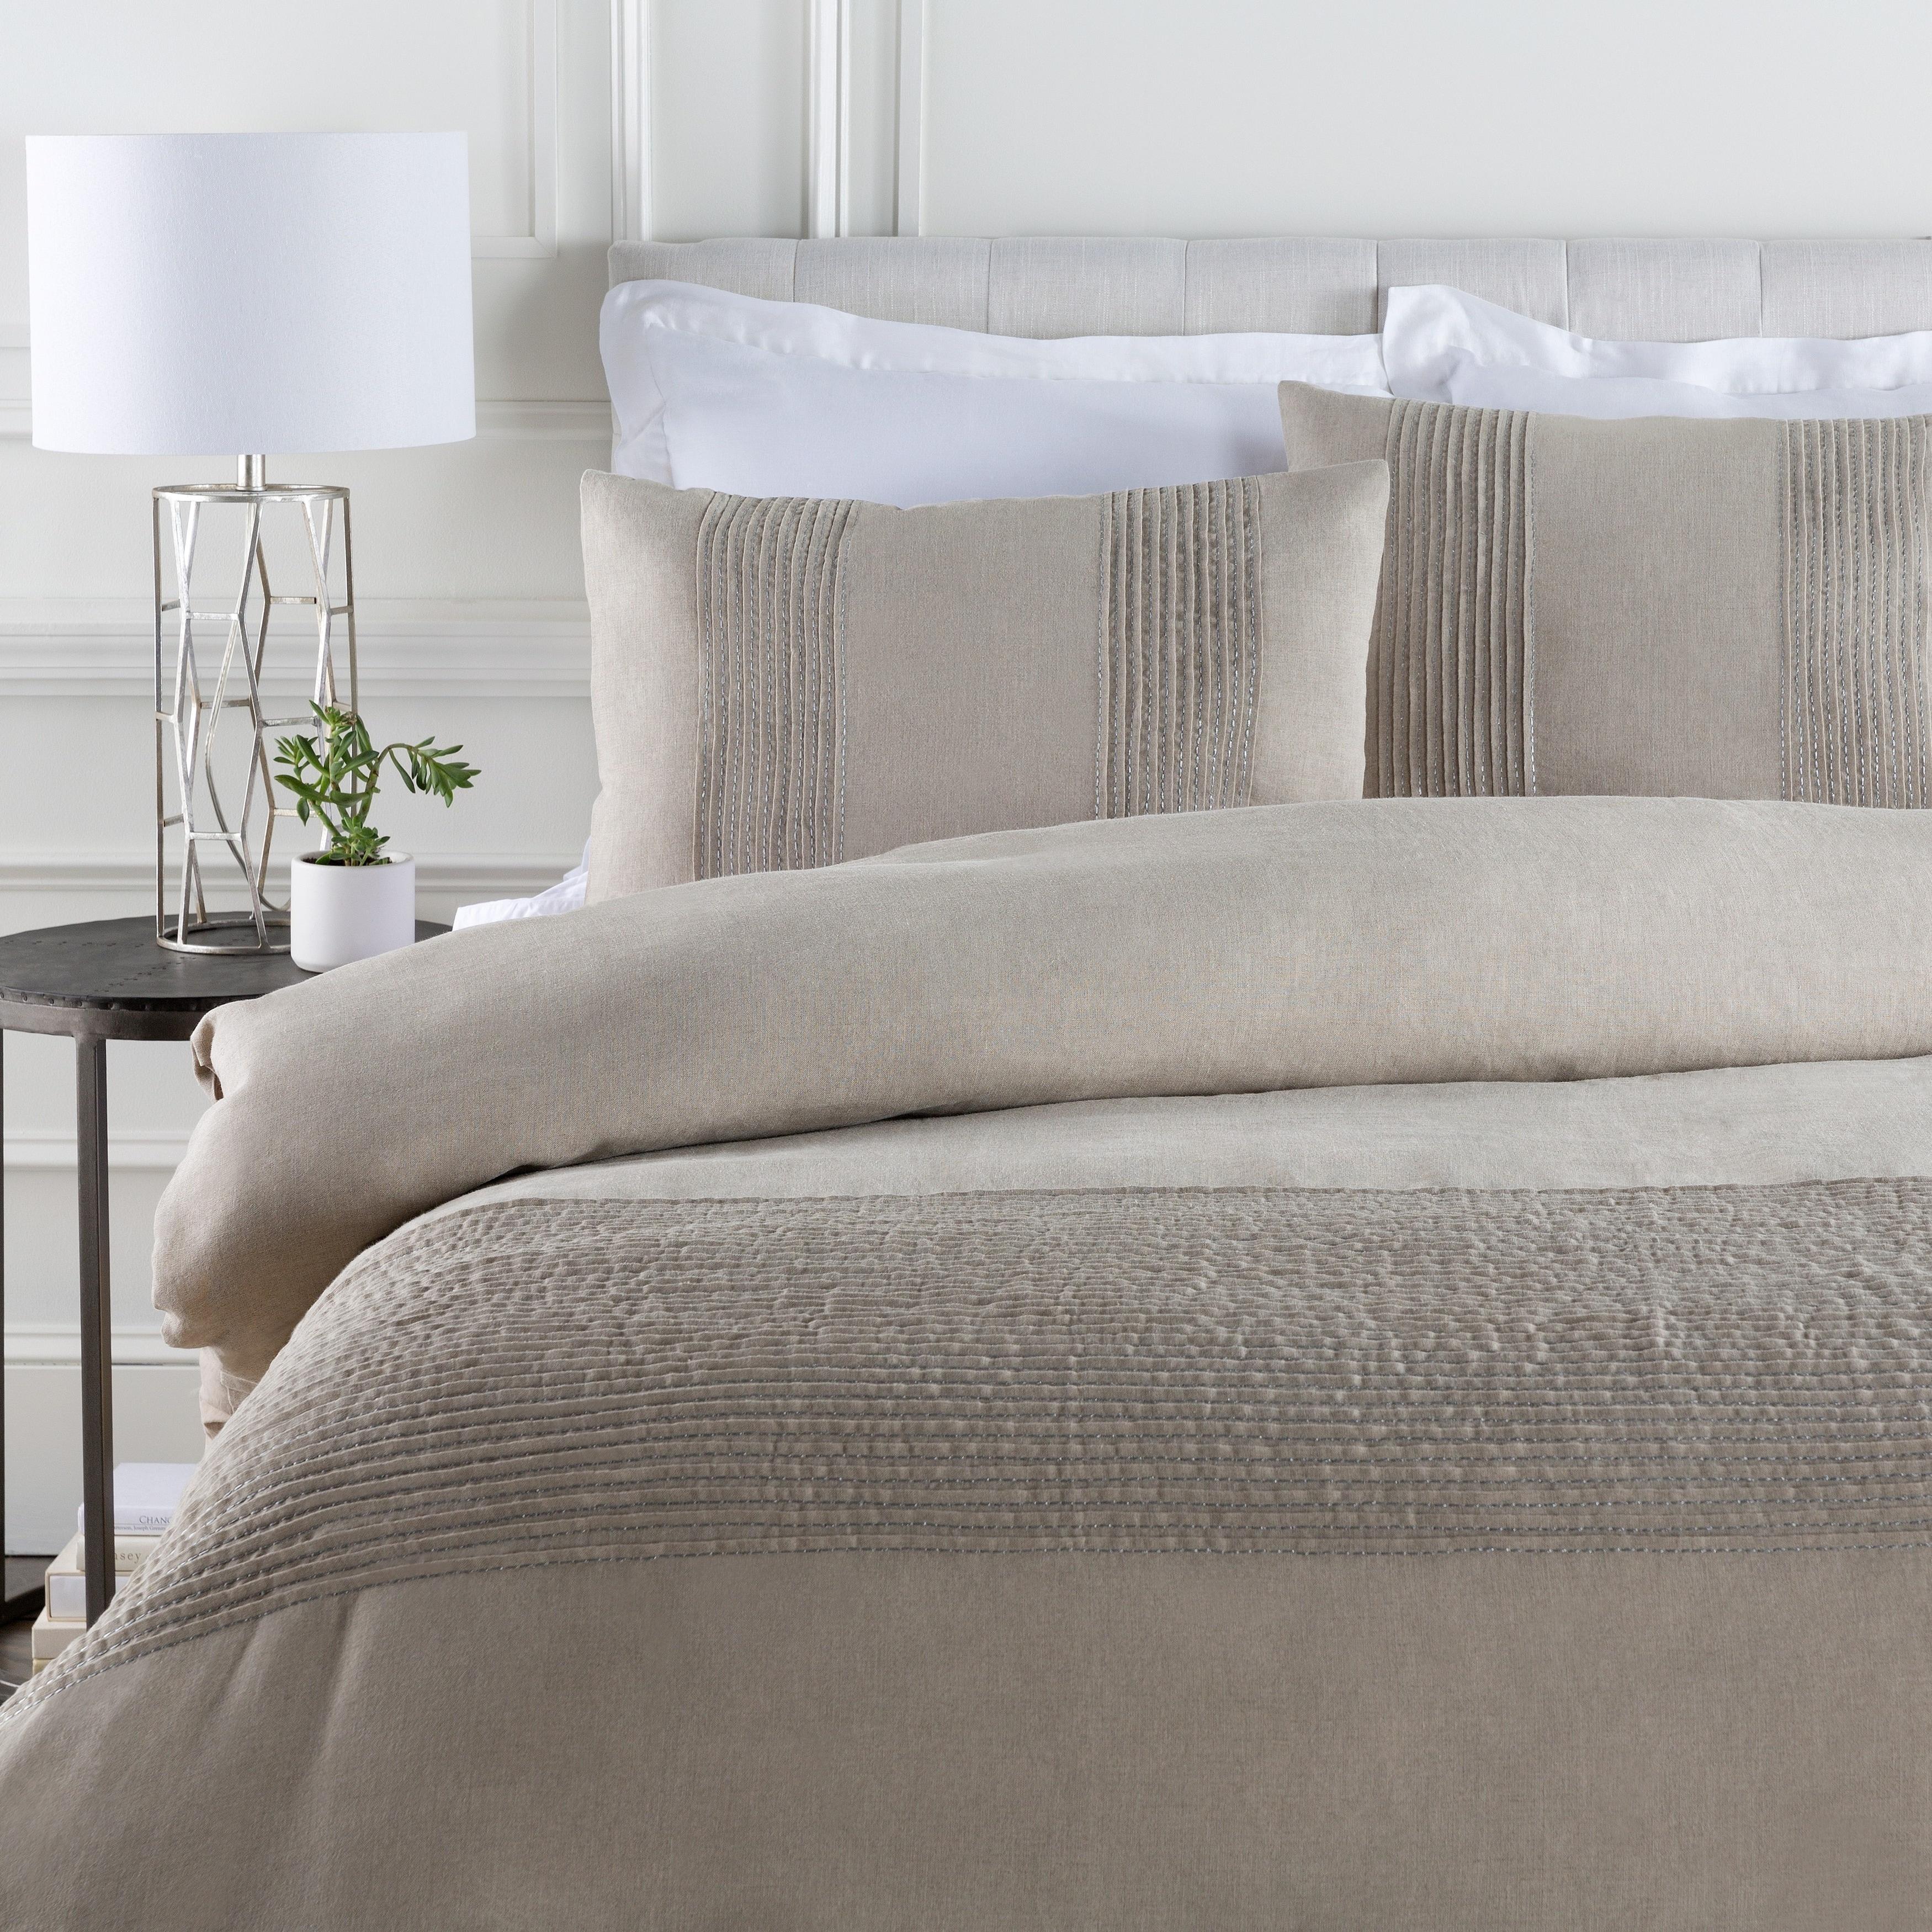 Coburn Grey Linen Duvet Cover Set   Free Shipping Today   Overstock.com    17722295